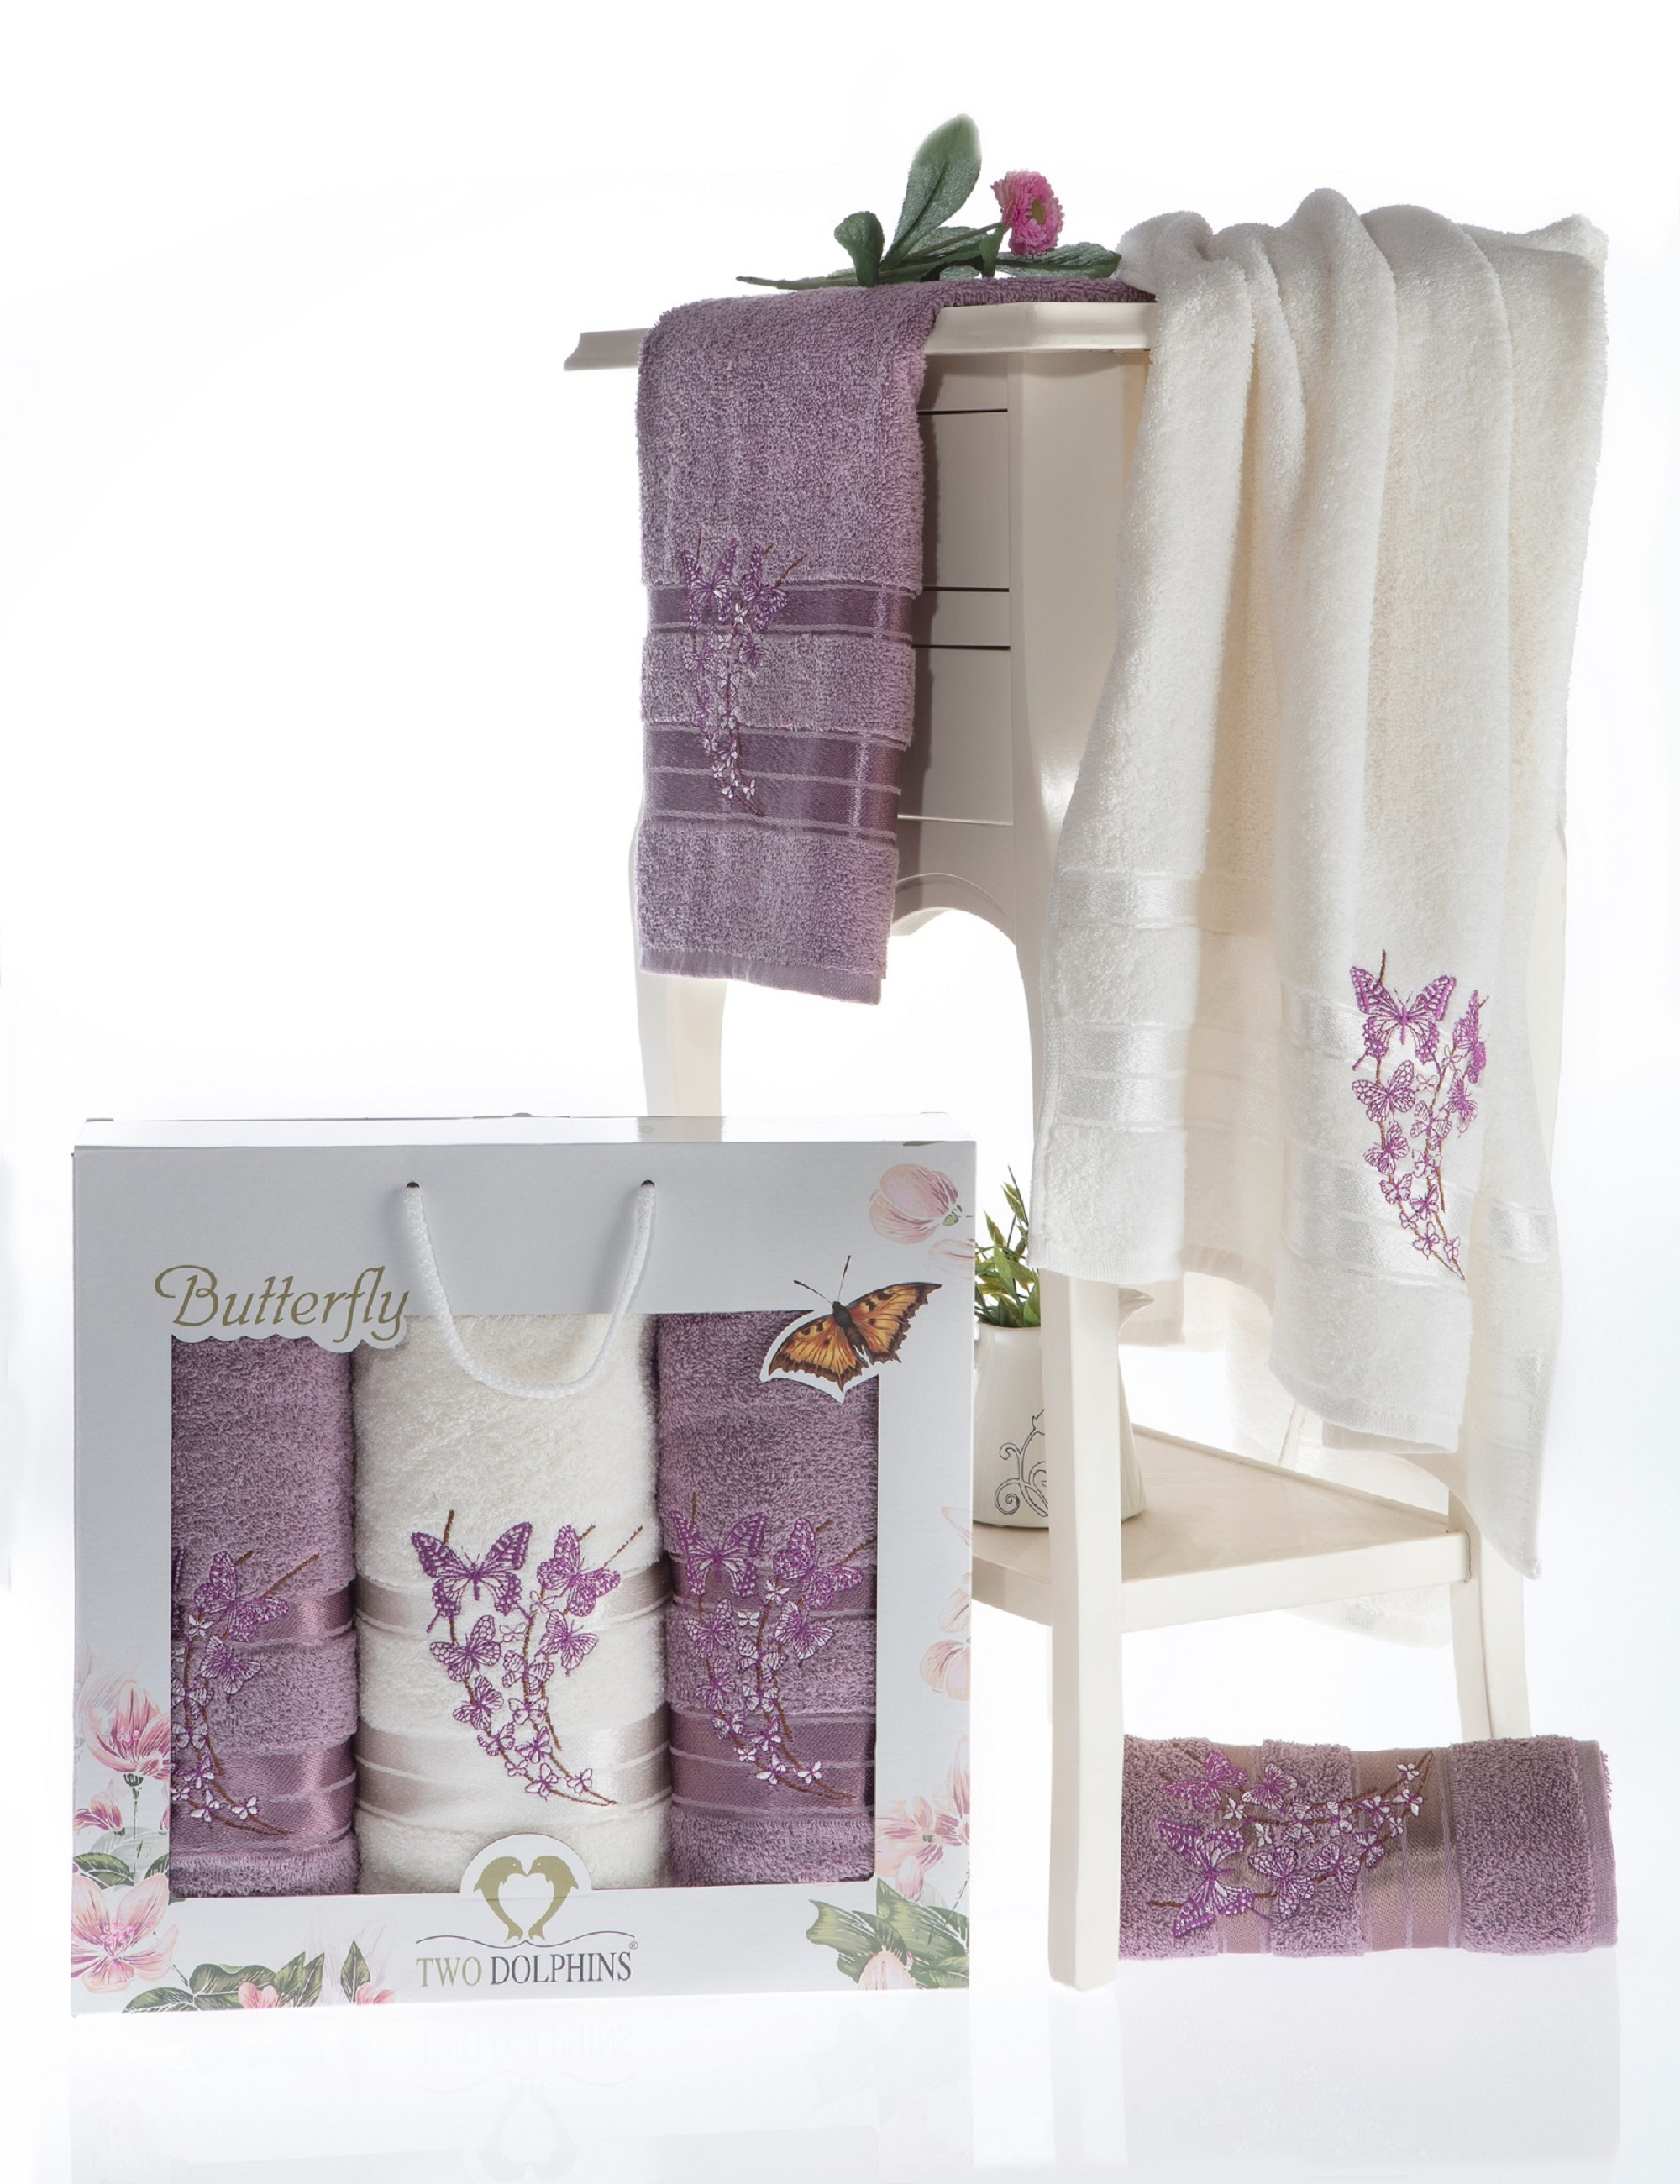 где купить Полотенца Two Dolphins Полотенце Butterfly Цвет: Баклажан (50х90 см - 2 шт,70х140 см) по лучшей цене